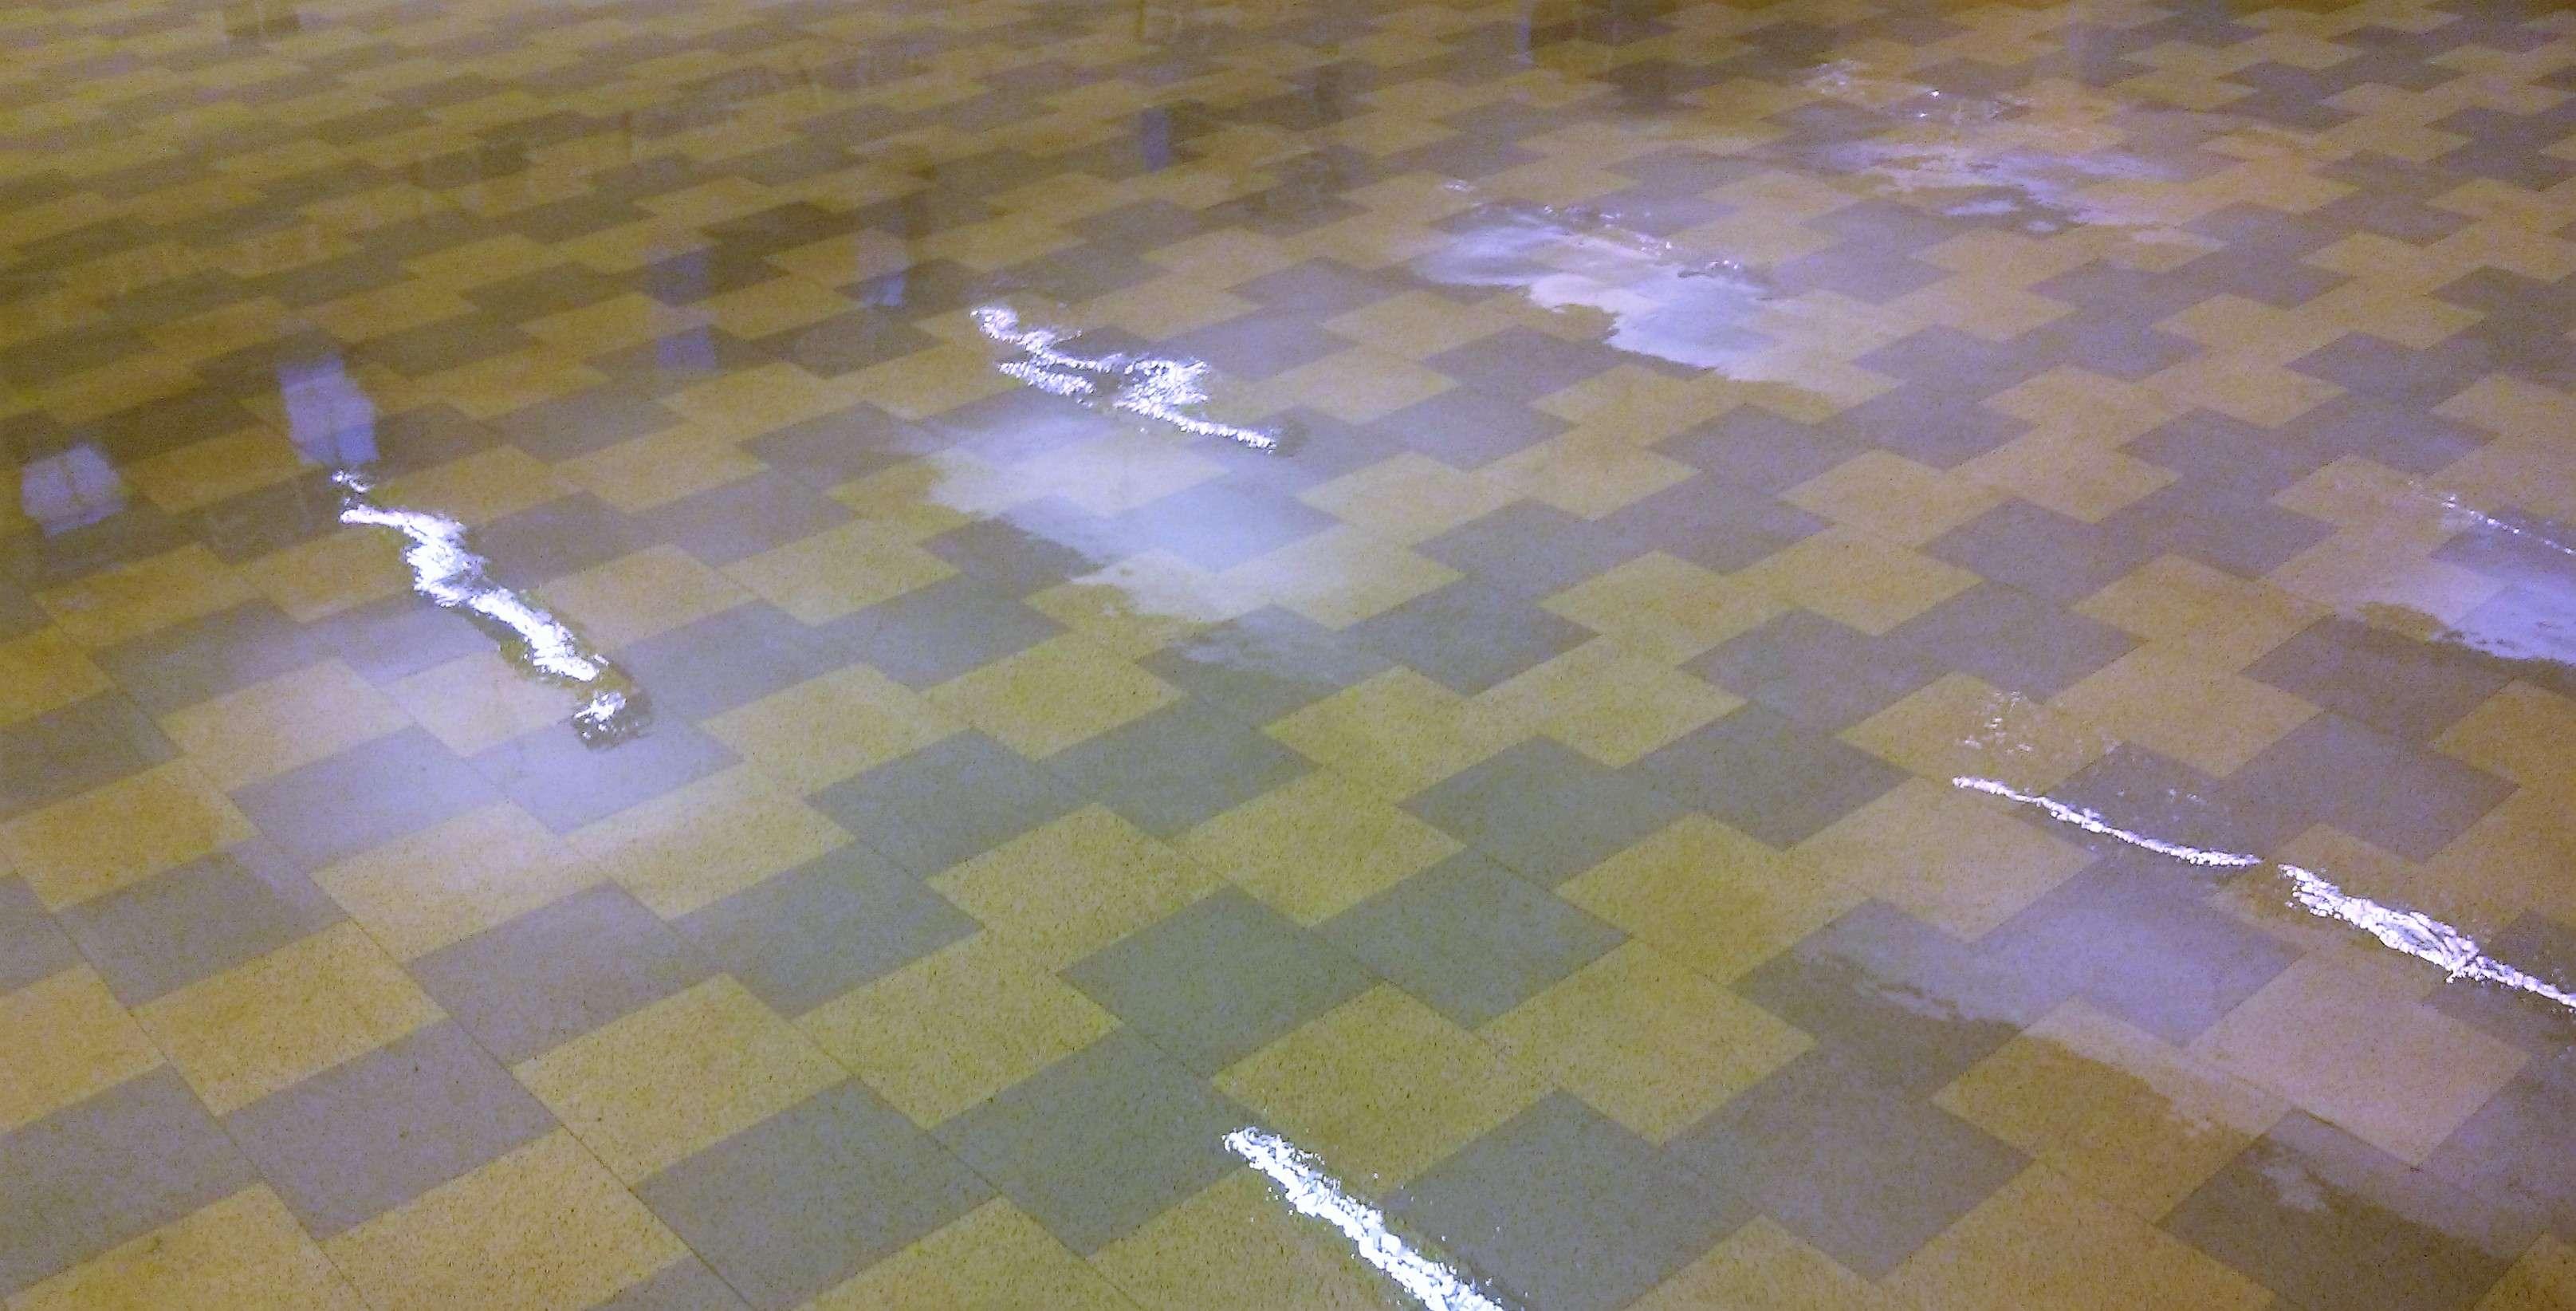 Restore shine to vinyl floor of old vct floor tile in minneapolis old vct floor tile restored in minneapolis dailygadgetfo Gallery